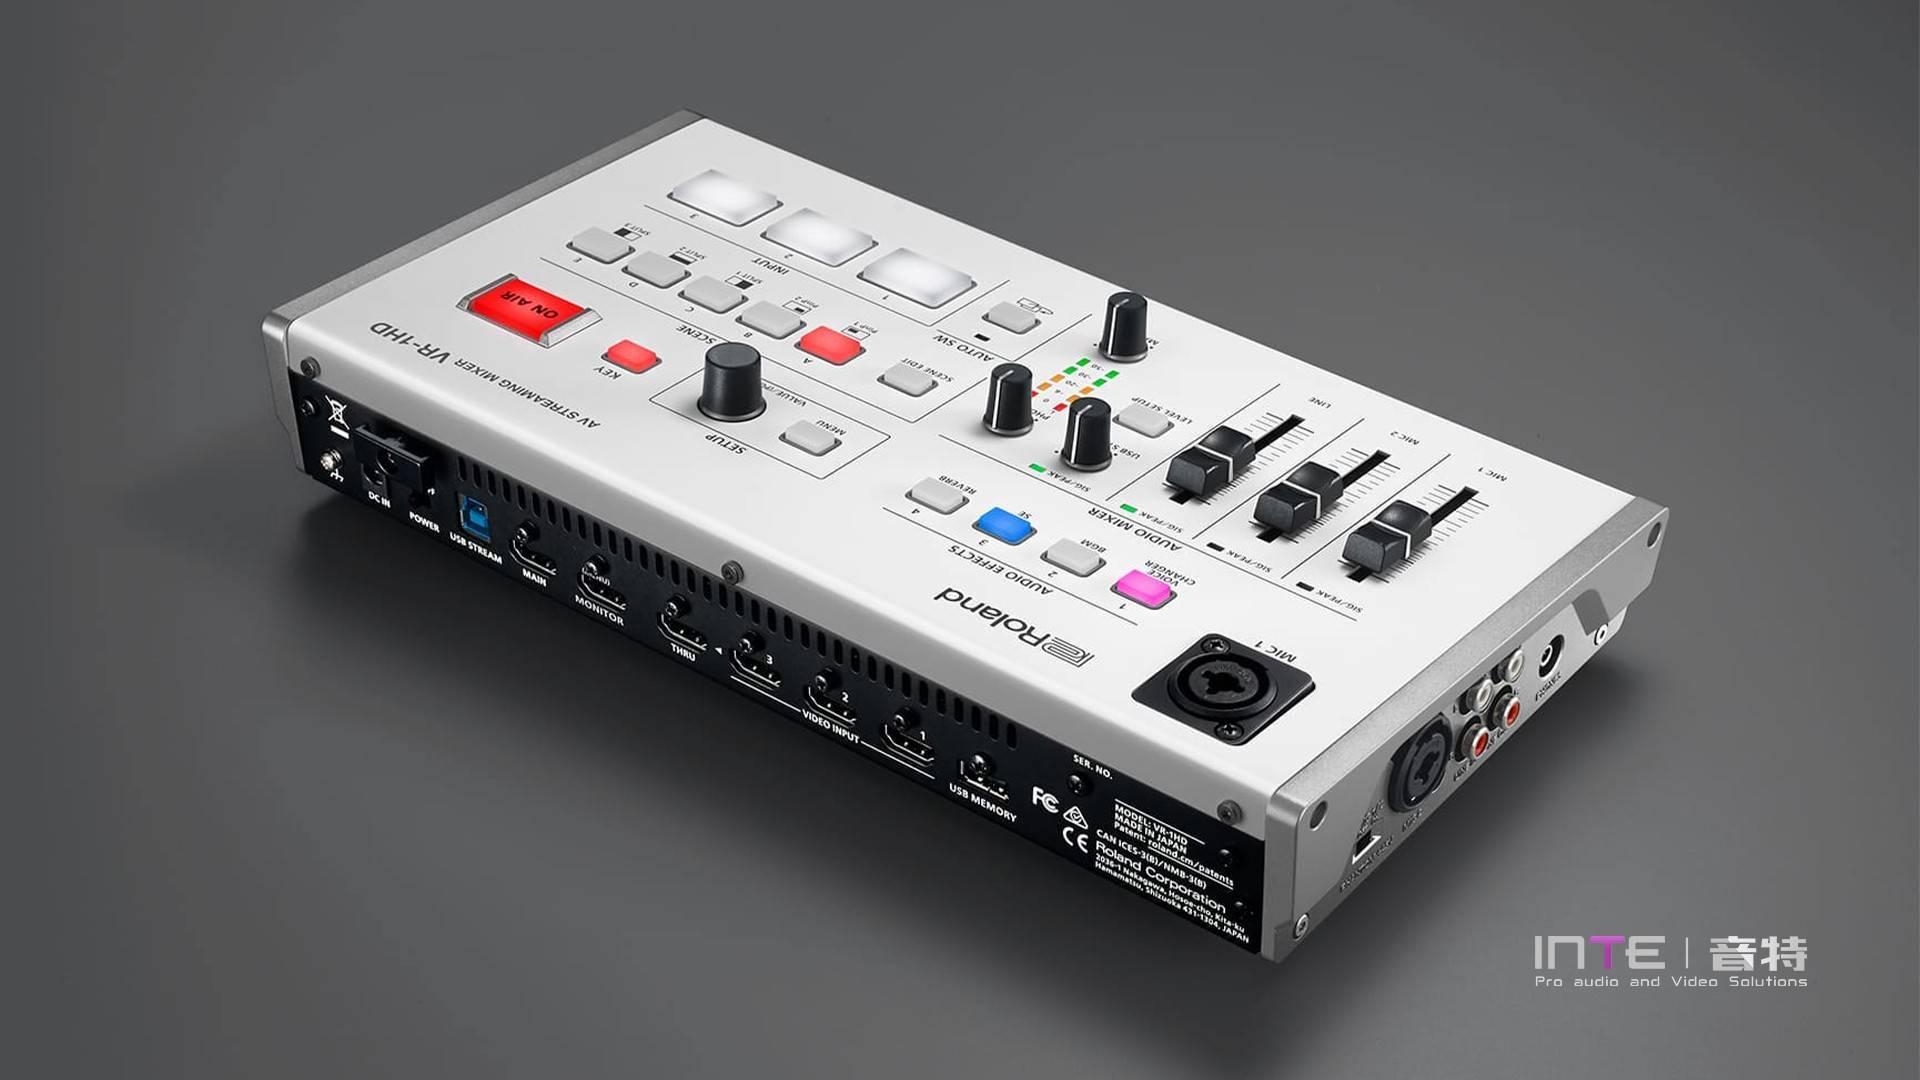 ROLANDVR-1HD高清音视频直播切换台